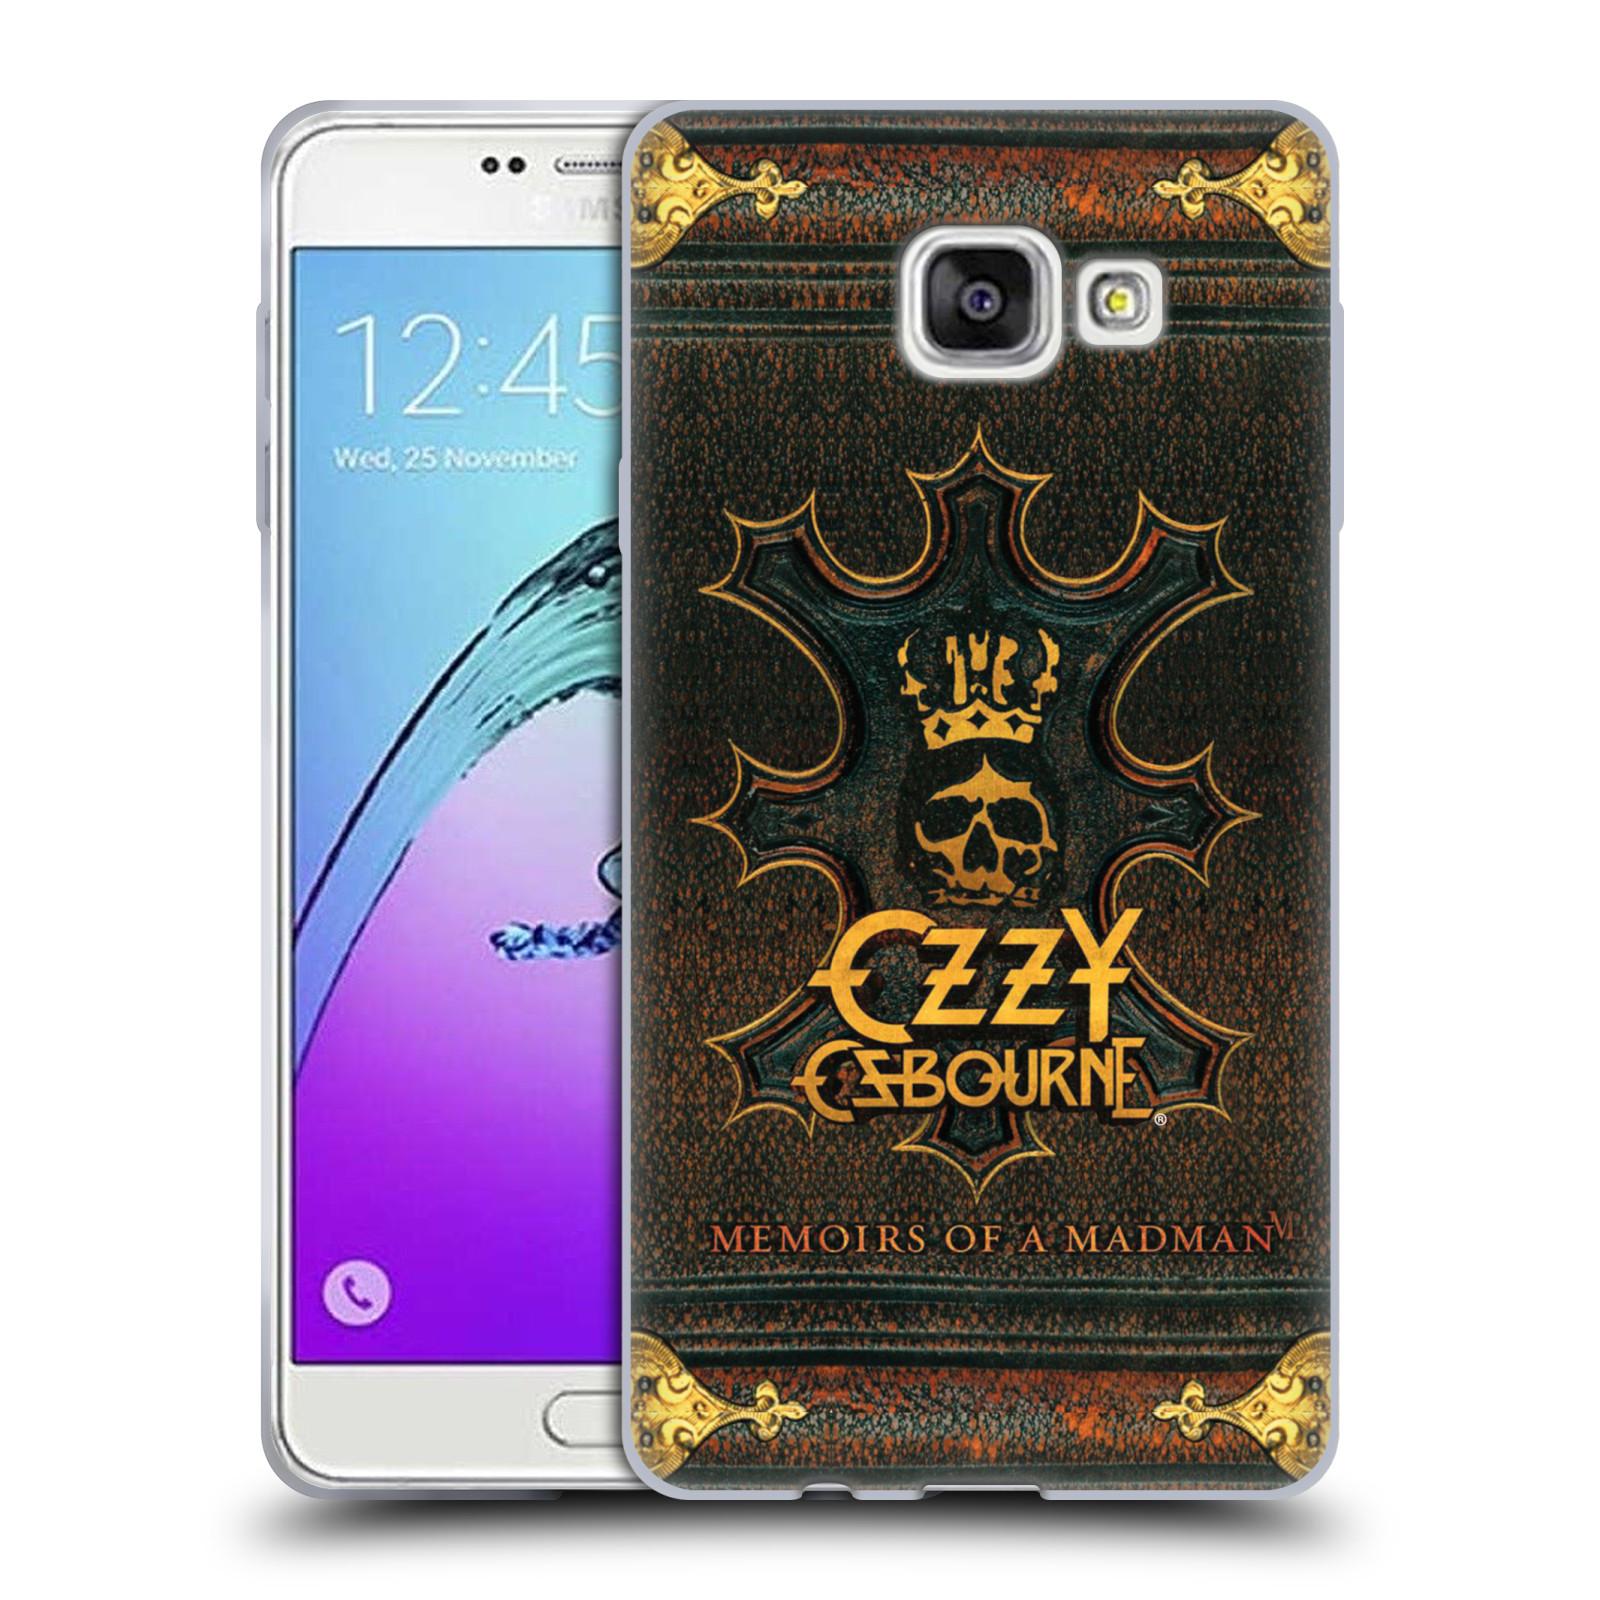 HEAD CASE silikonový obal na mobil Samsung Galaxy A7 2017 (A720) zpěvák Ozzy Osbourne koruna